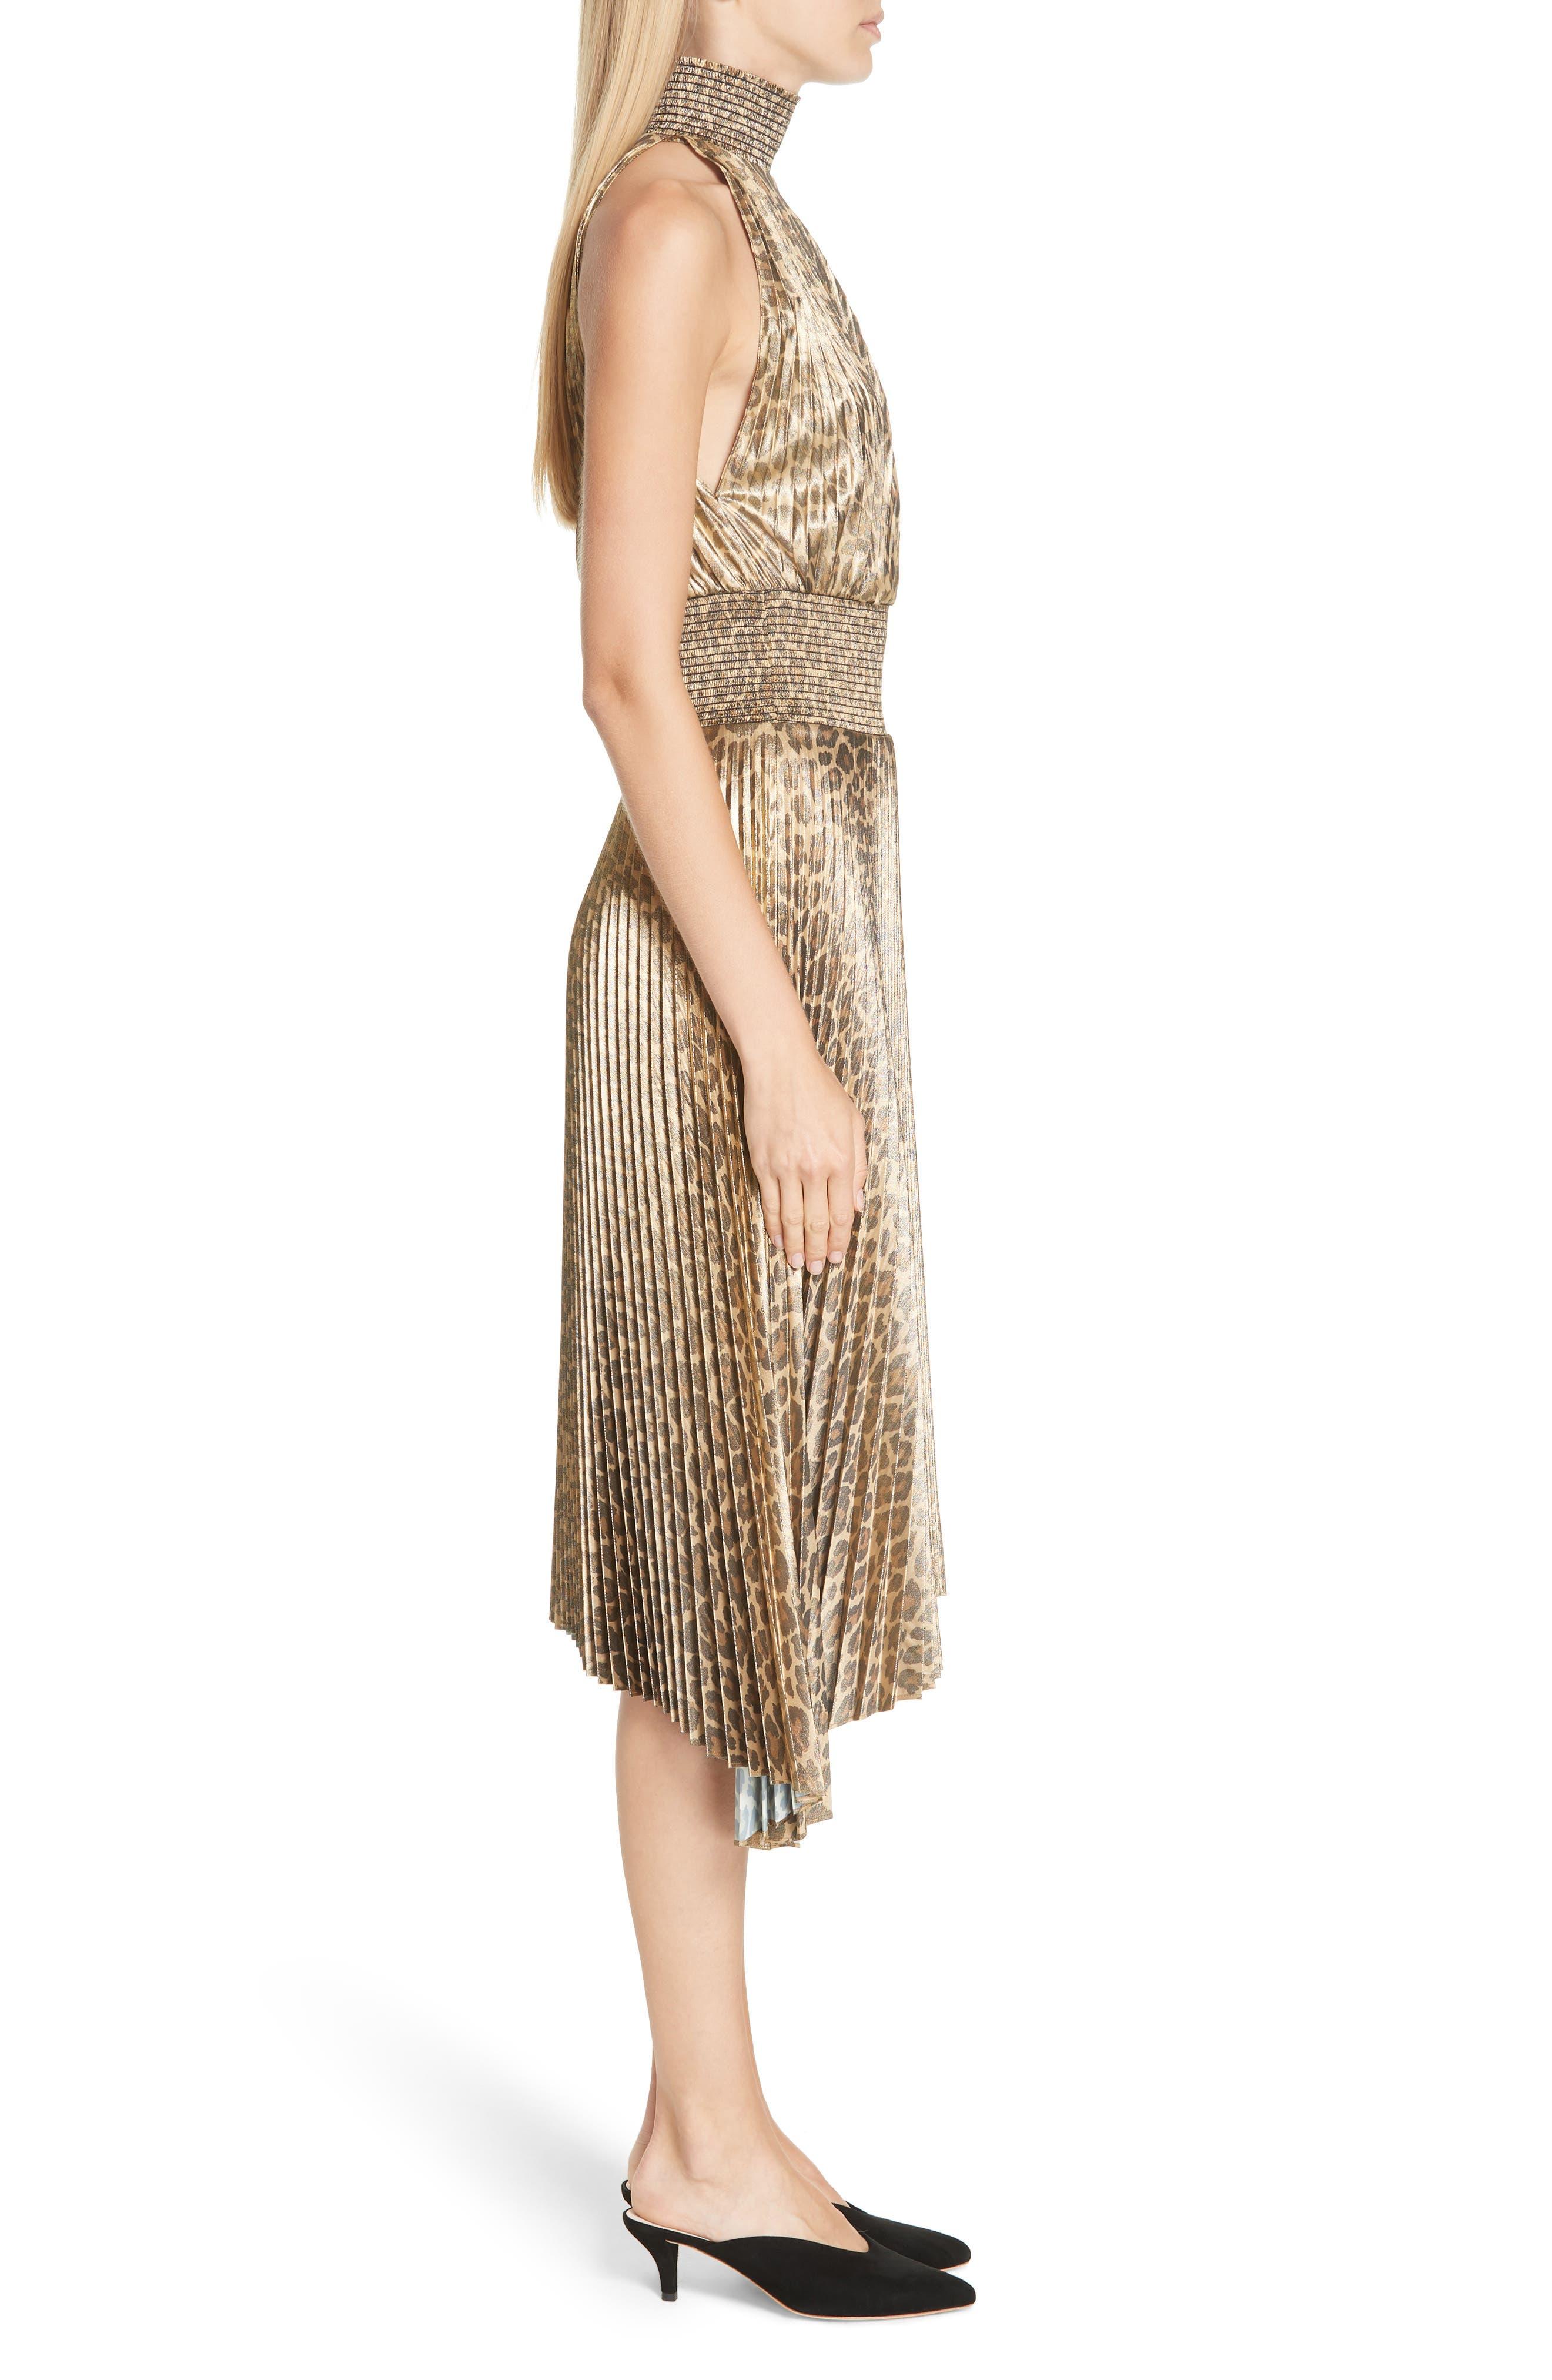 Renzo Leopard Print Metallic Foil Dress,                             Alternate thumbnail 3, color,                             METALLIC GOLD